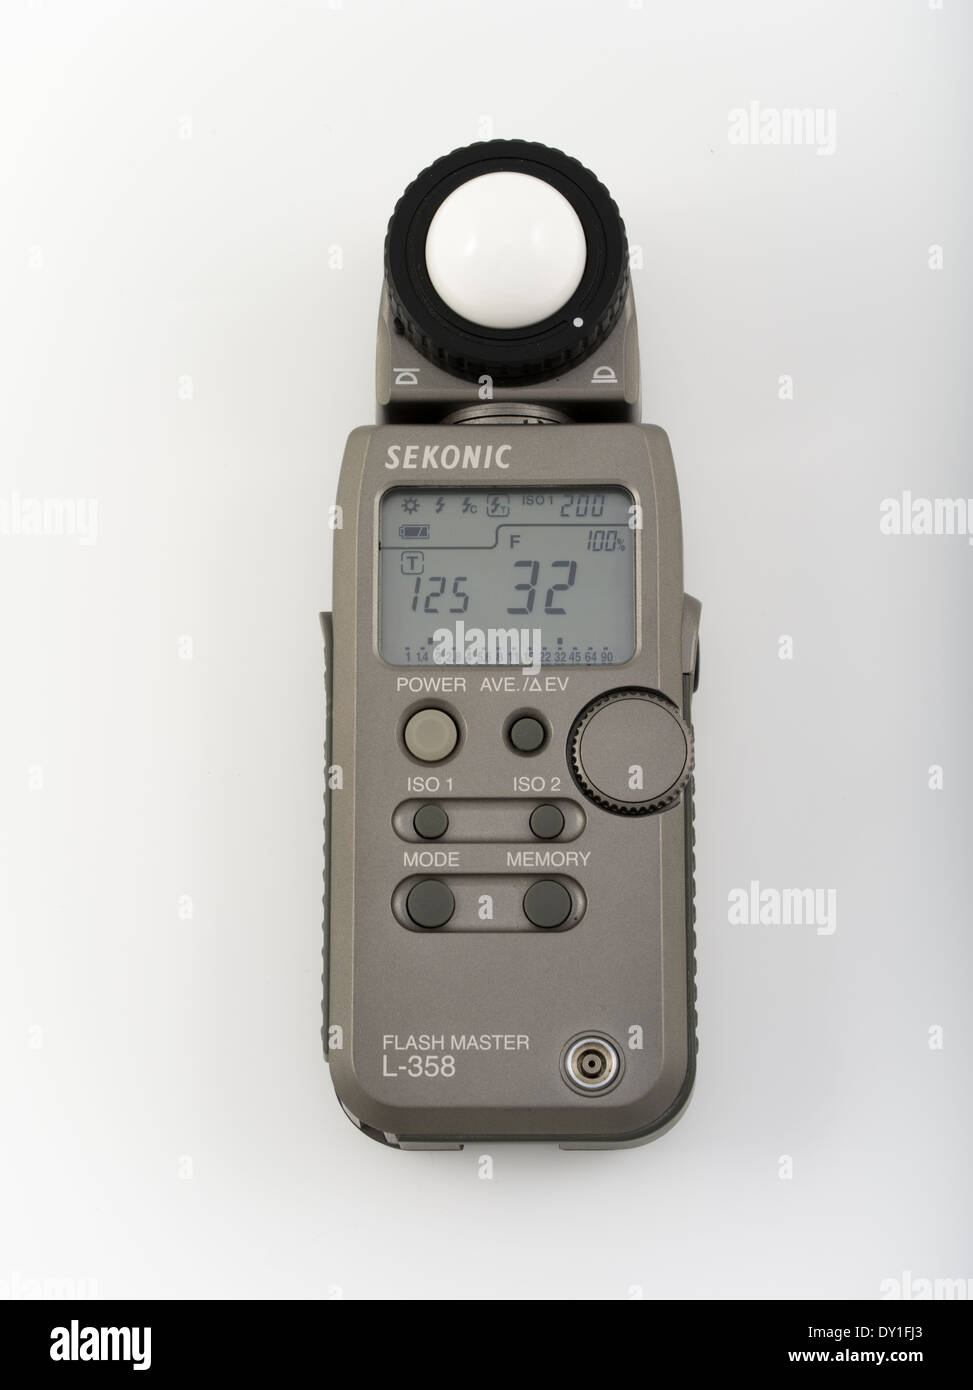 Sekonic Flashmaster L 358 Lightmeter Light Meter For Photography  Cinematography   Stock Image